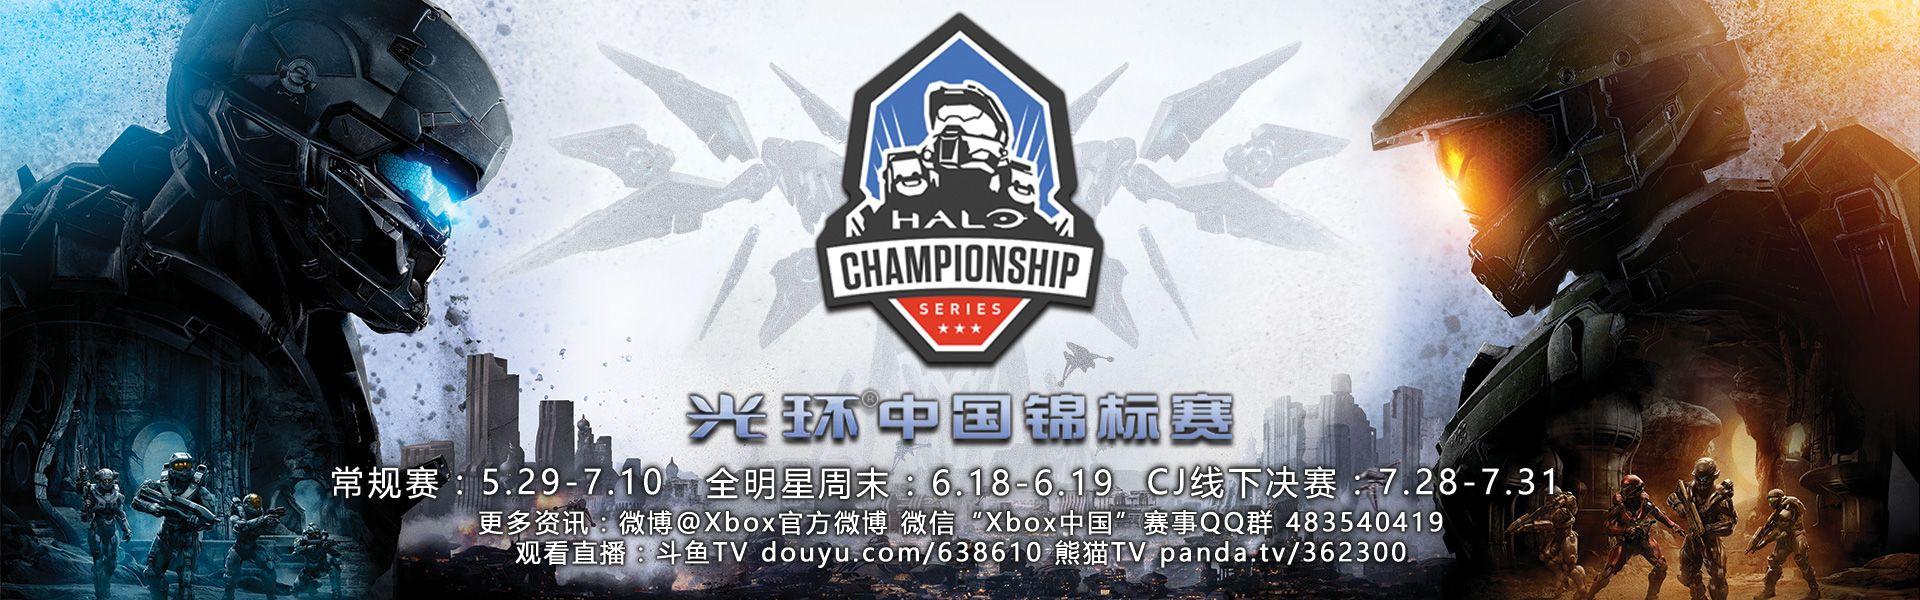 HWC China